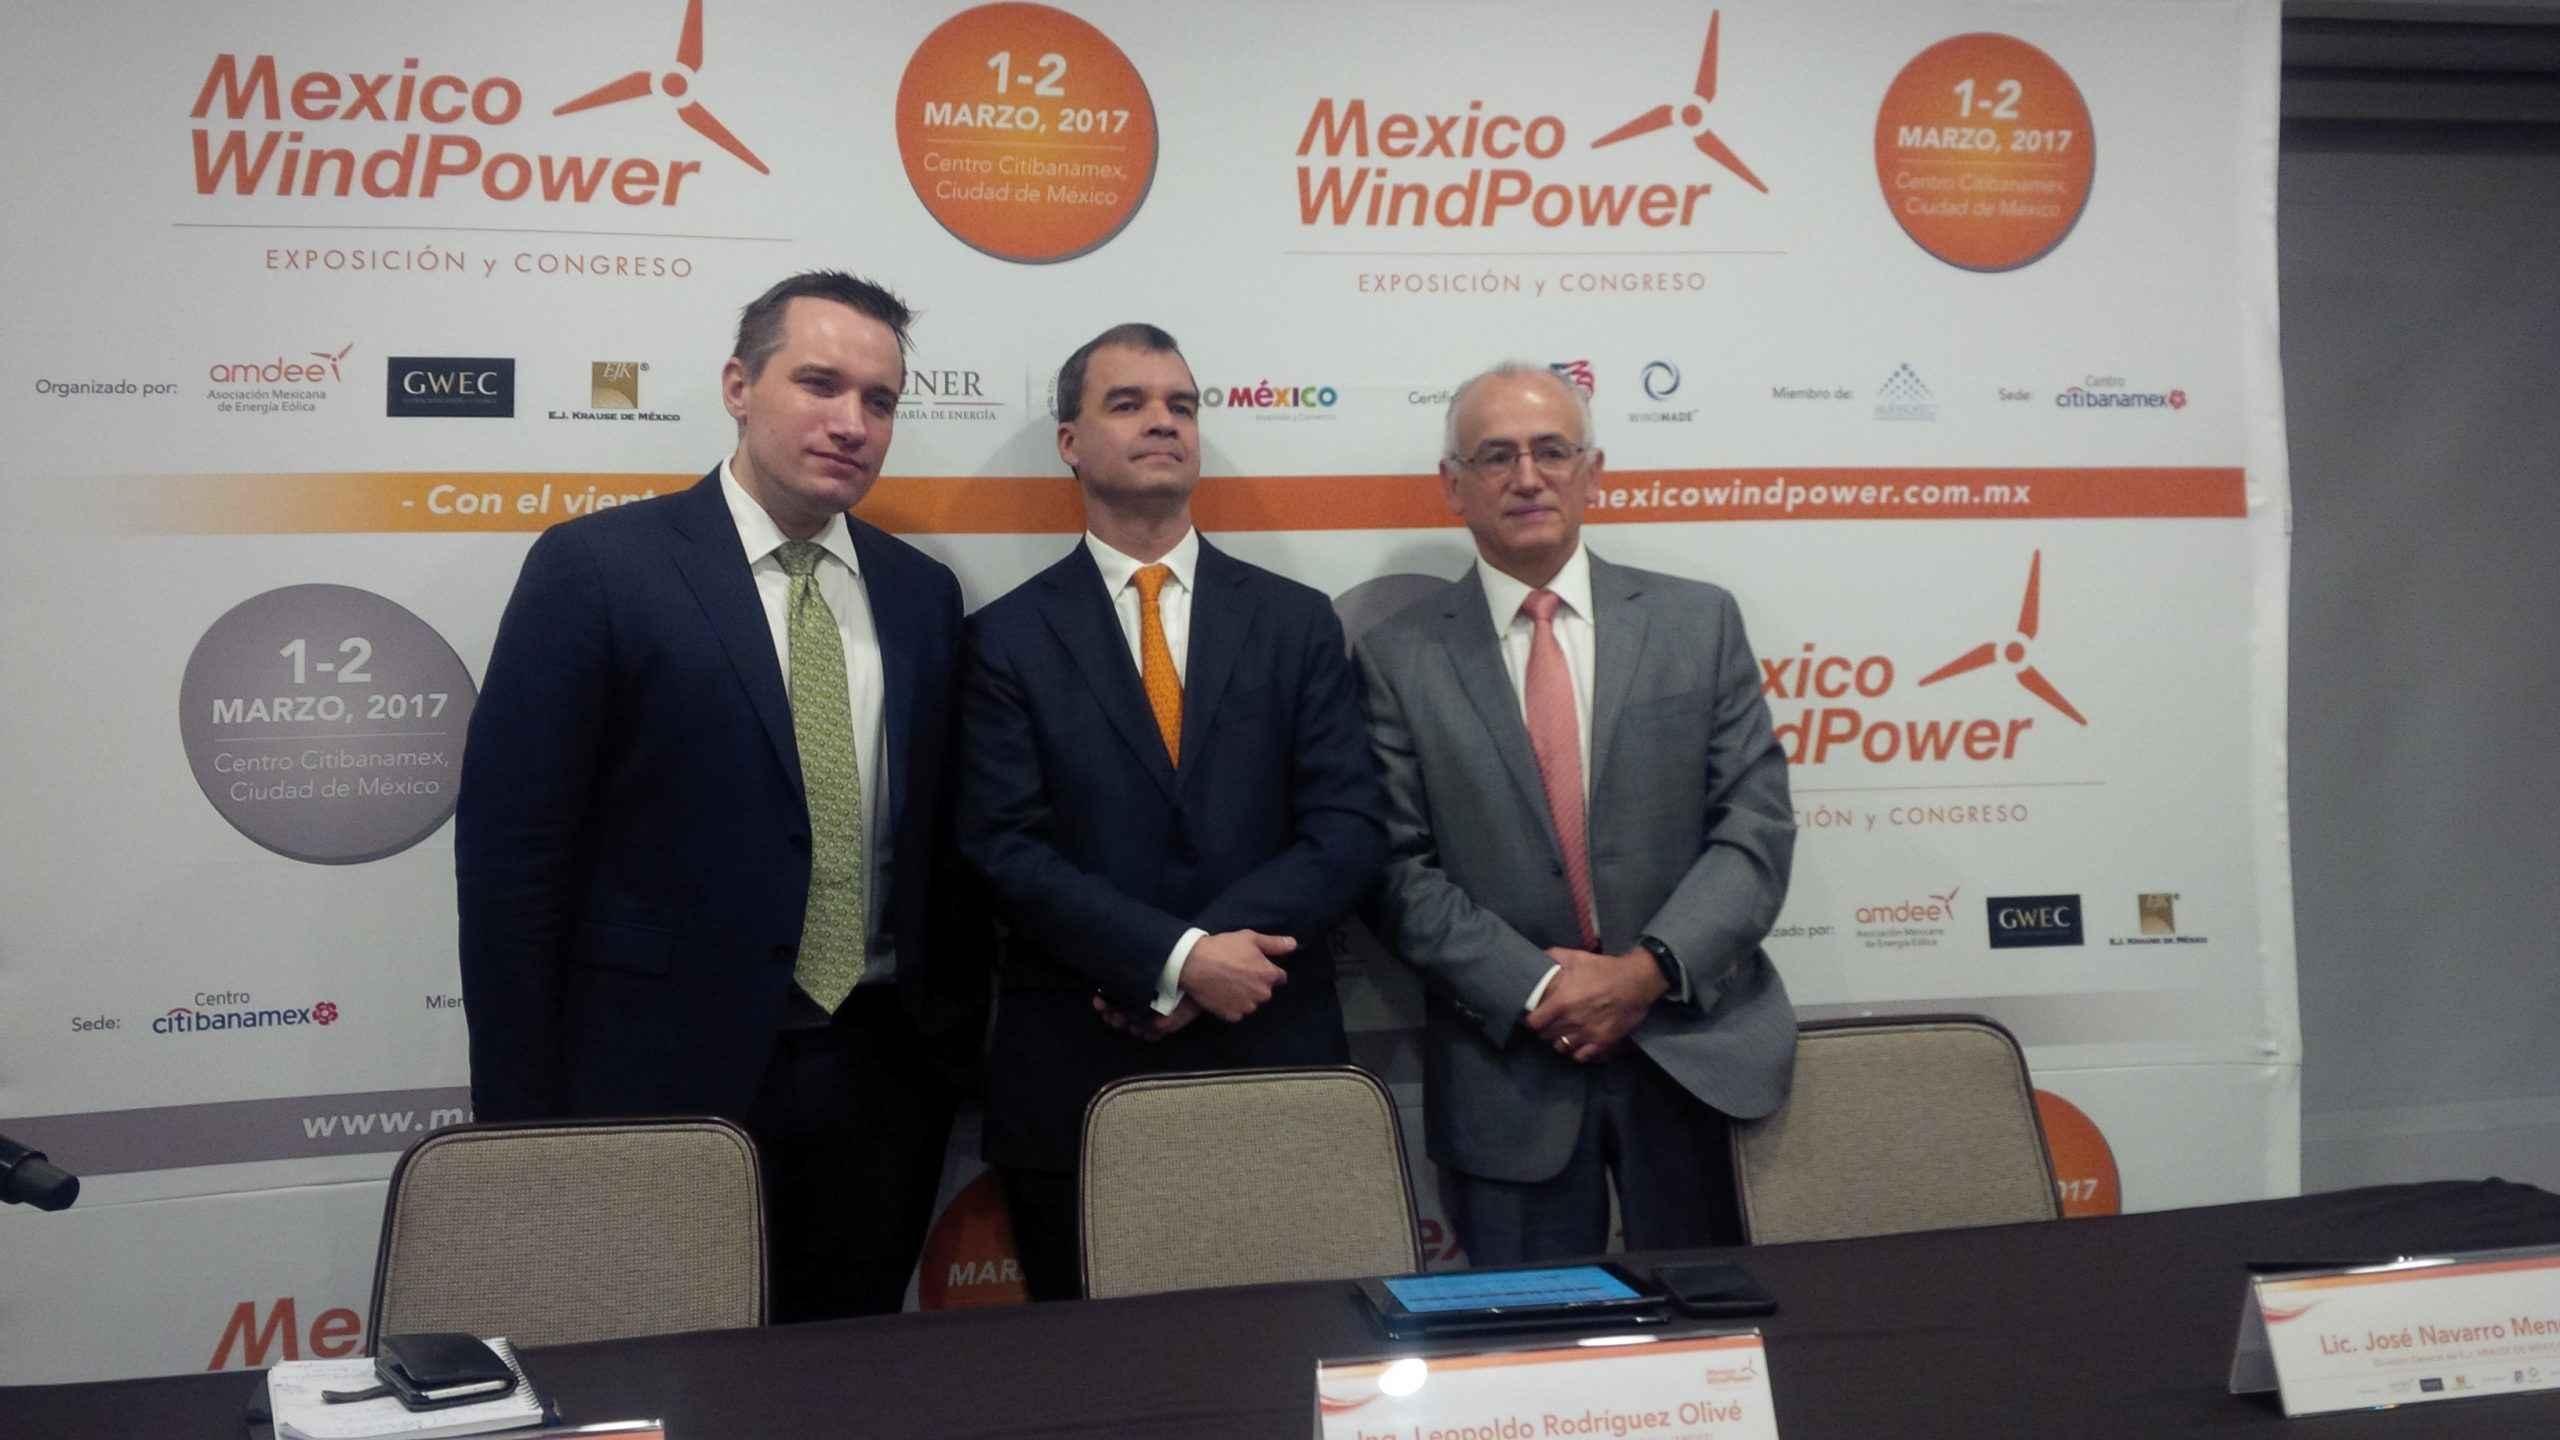 En México Wind Power analizarán energías limpias